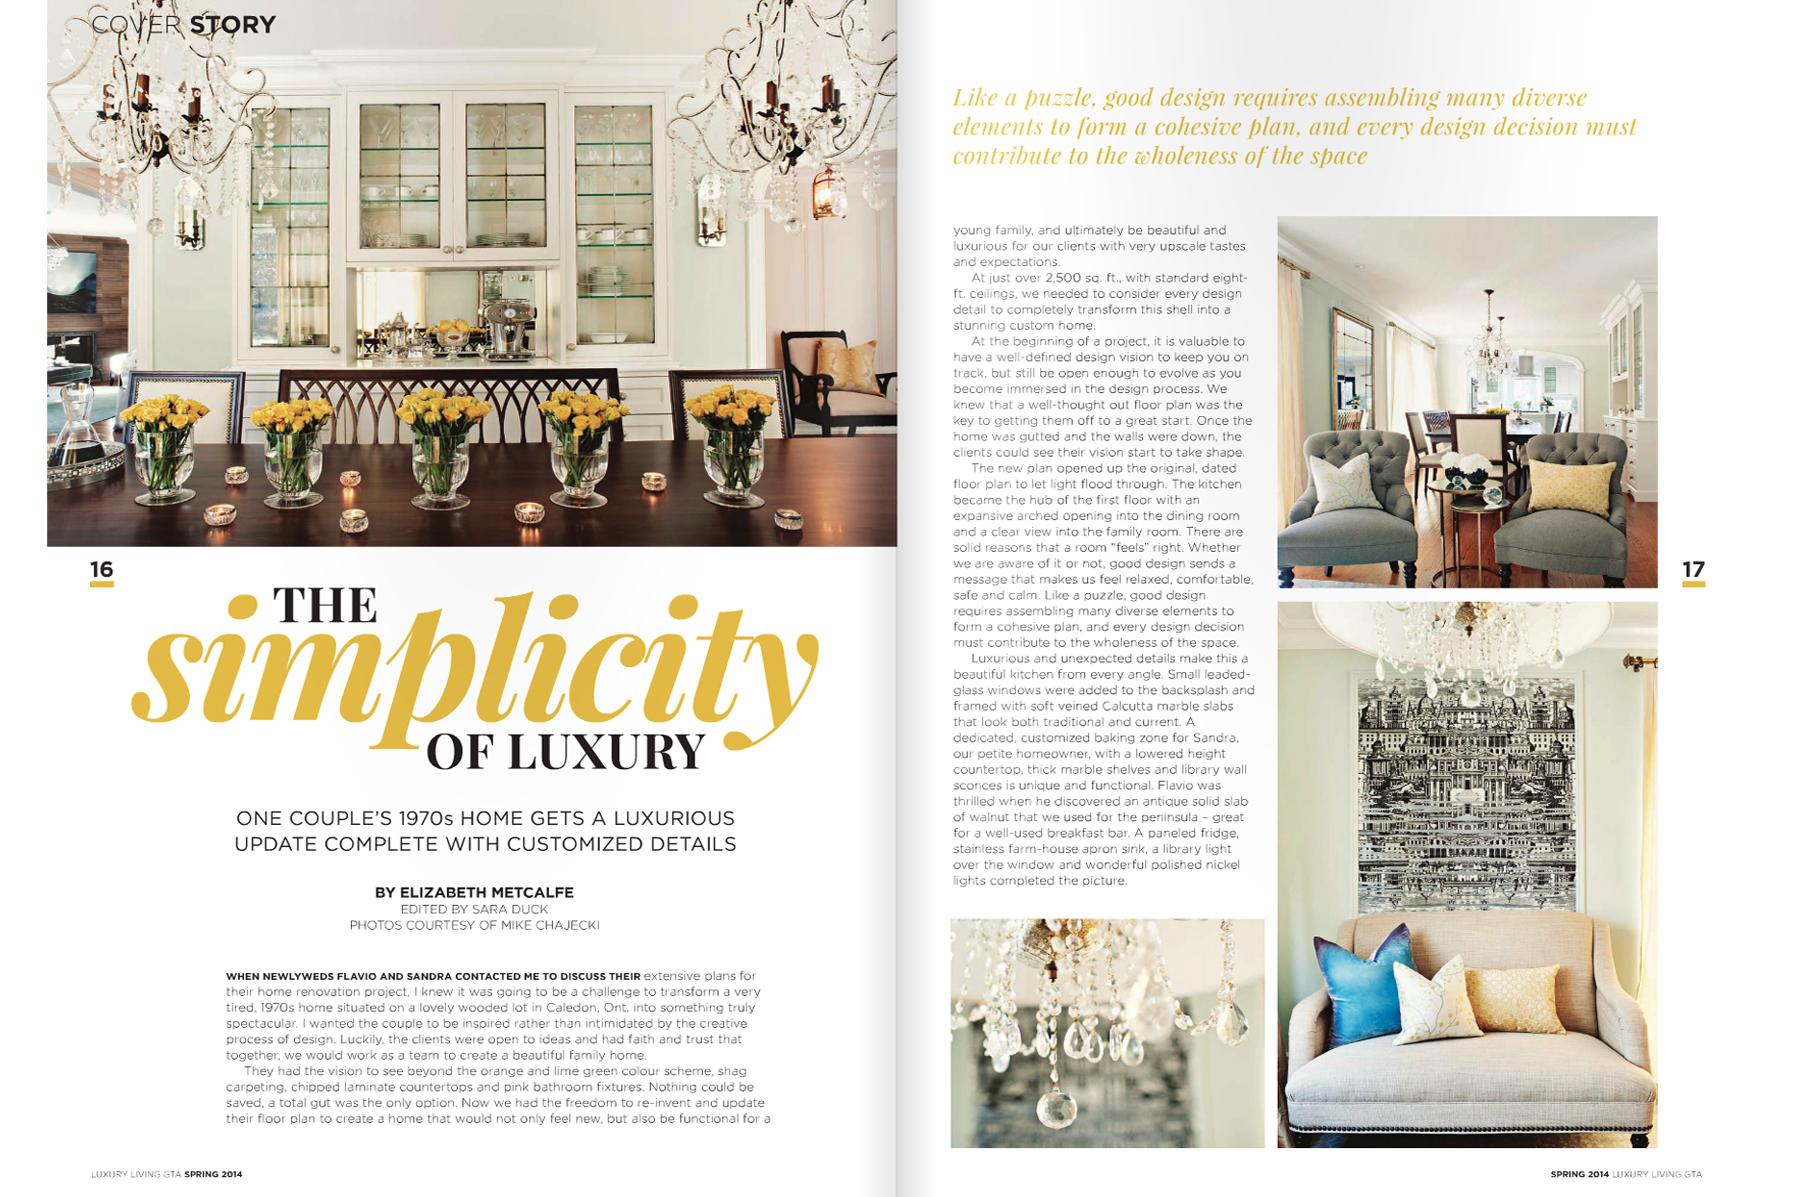 LuxuryLiving2014_2.jpg